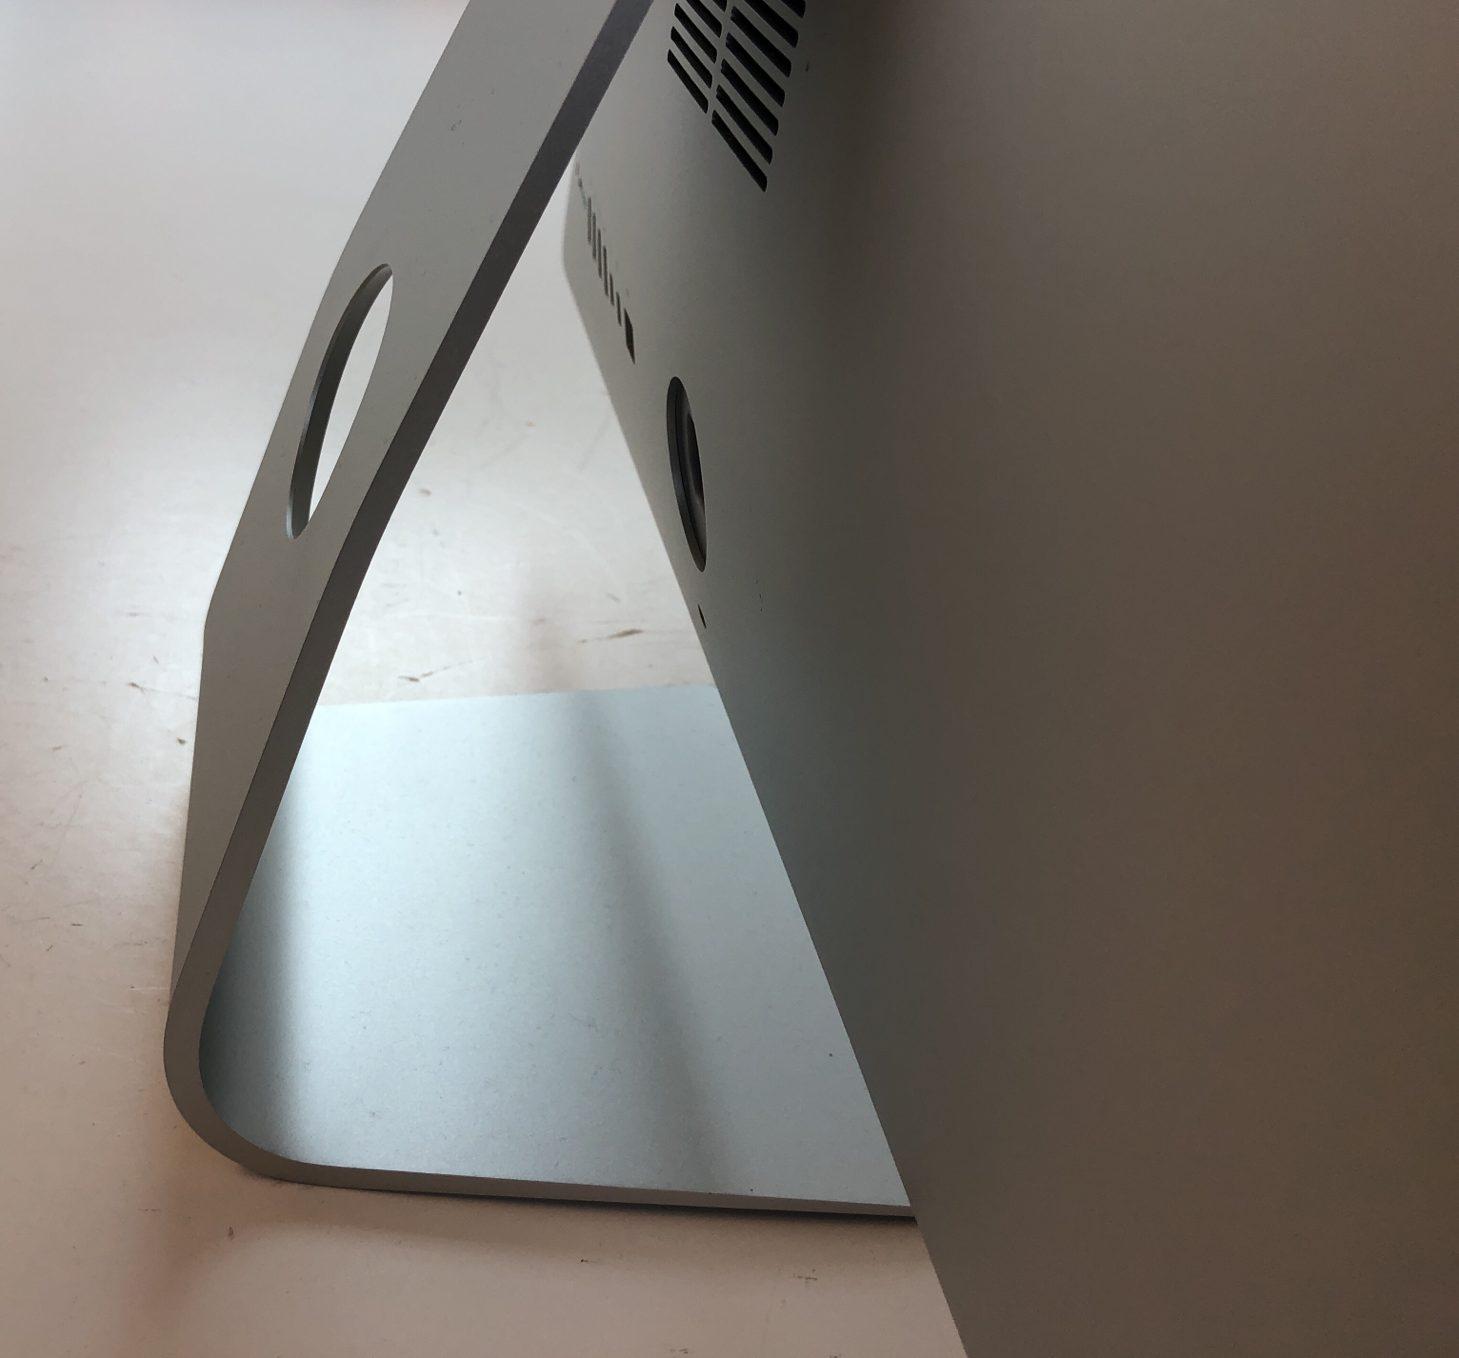 "iMac 21.5"" Late 2013 (Intel Quad-Core i5 2.9 GHz 8 GB RAM 1 TB Fusion Drive), Intel Quad-Core i5 2.9 GHz, 8 GB RAM, 1 TB Fusion Drive, bild 3"